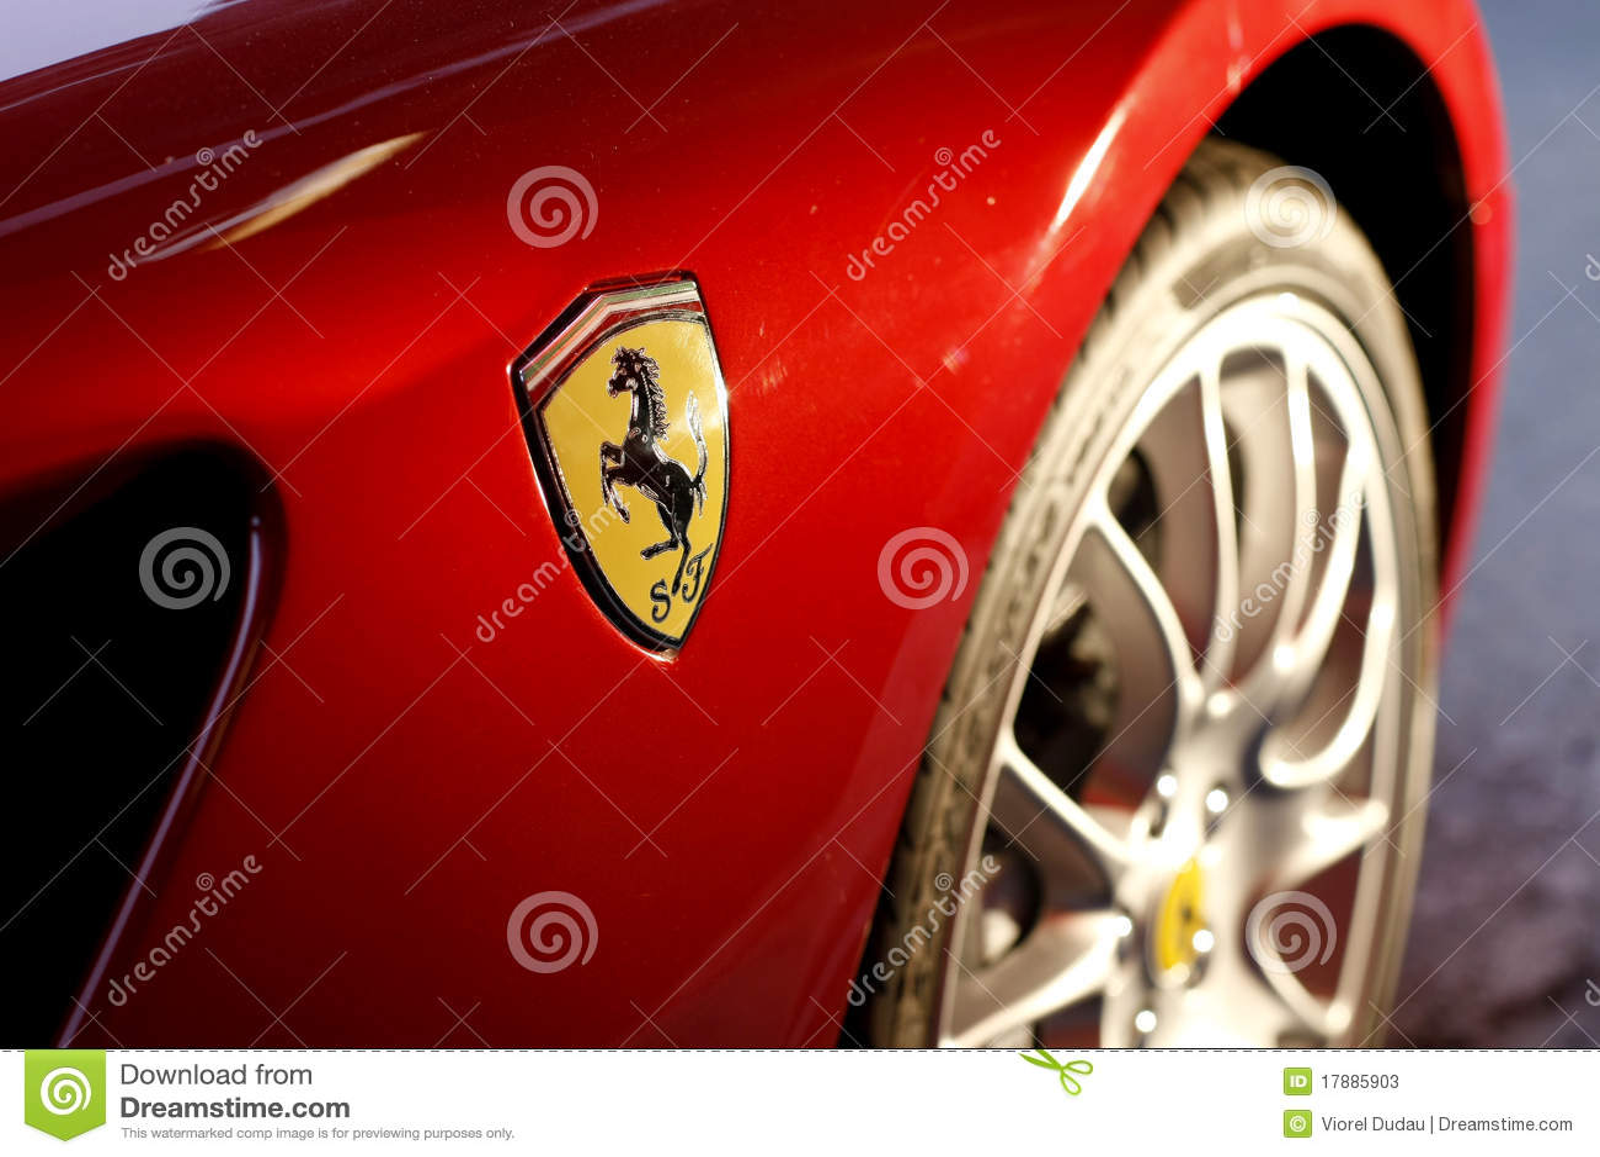 Ferrari Logo Editorial Stock Photo Image Of Power Automotive